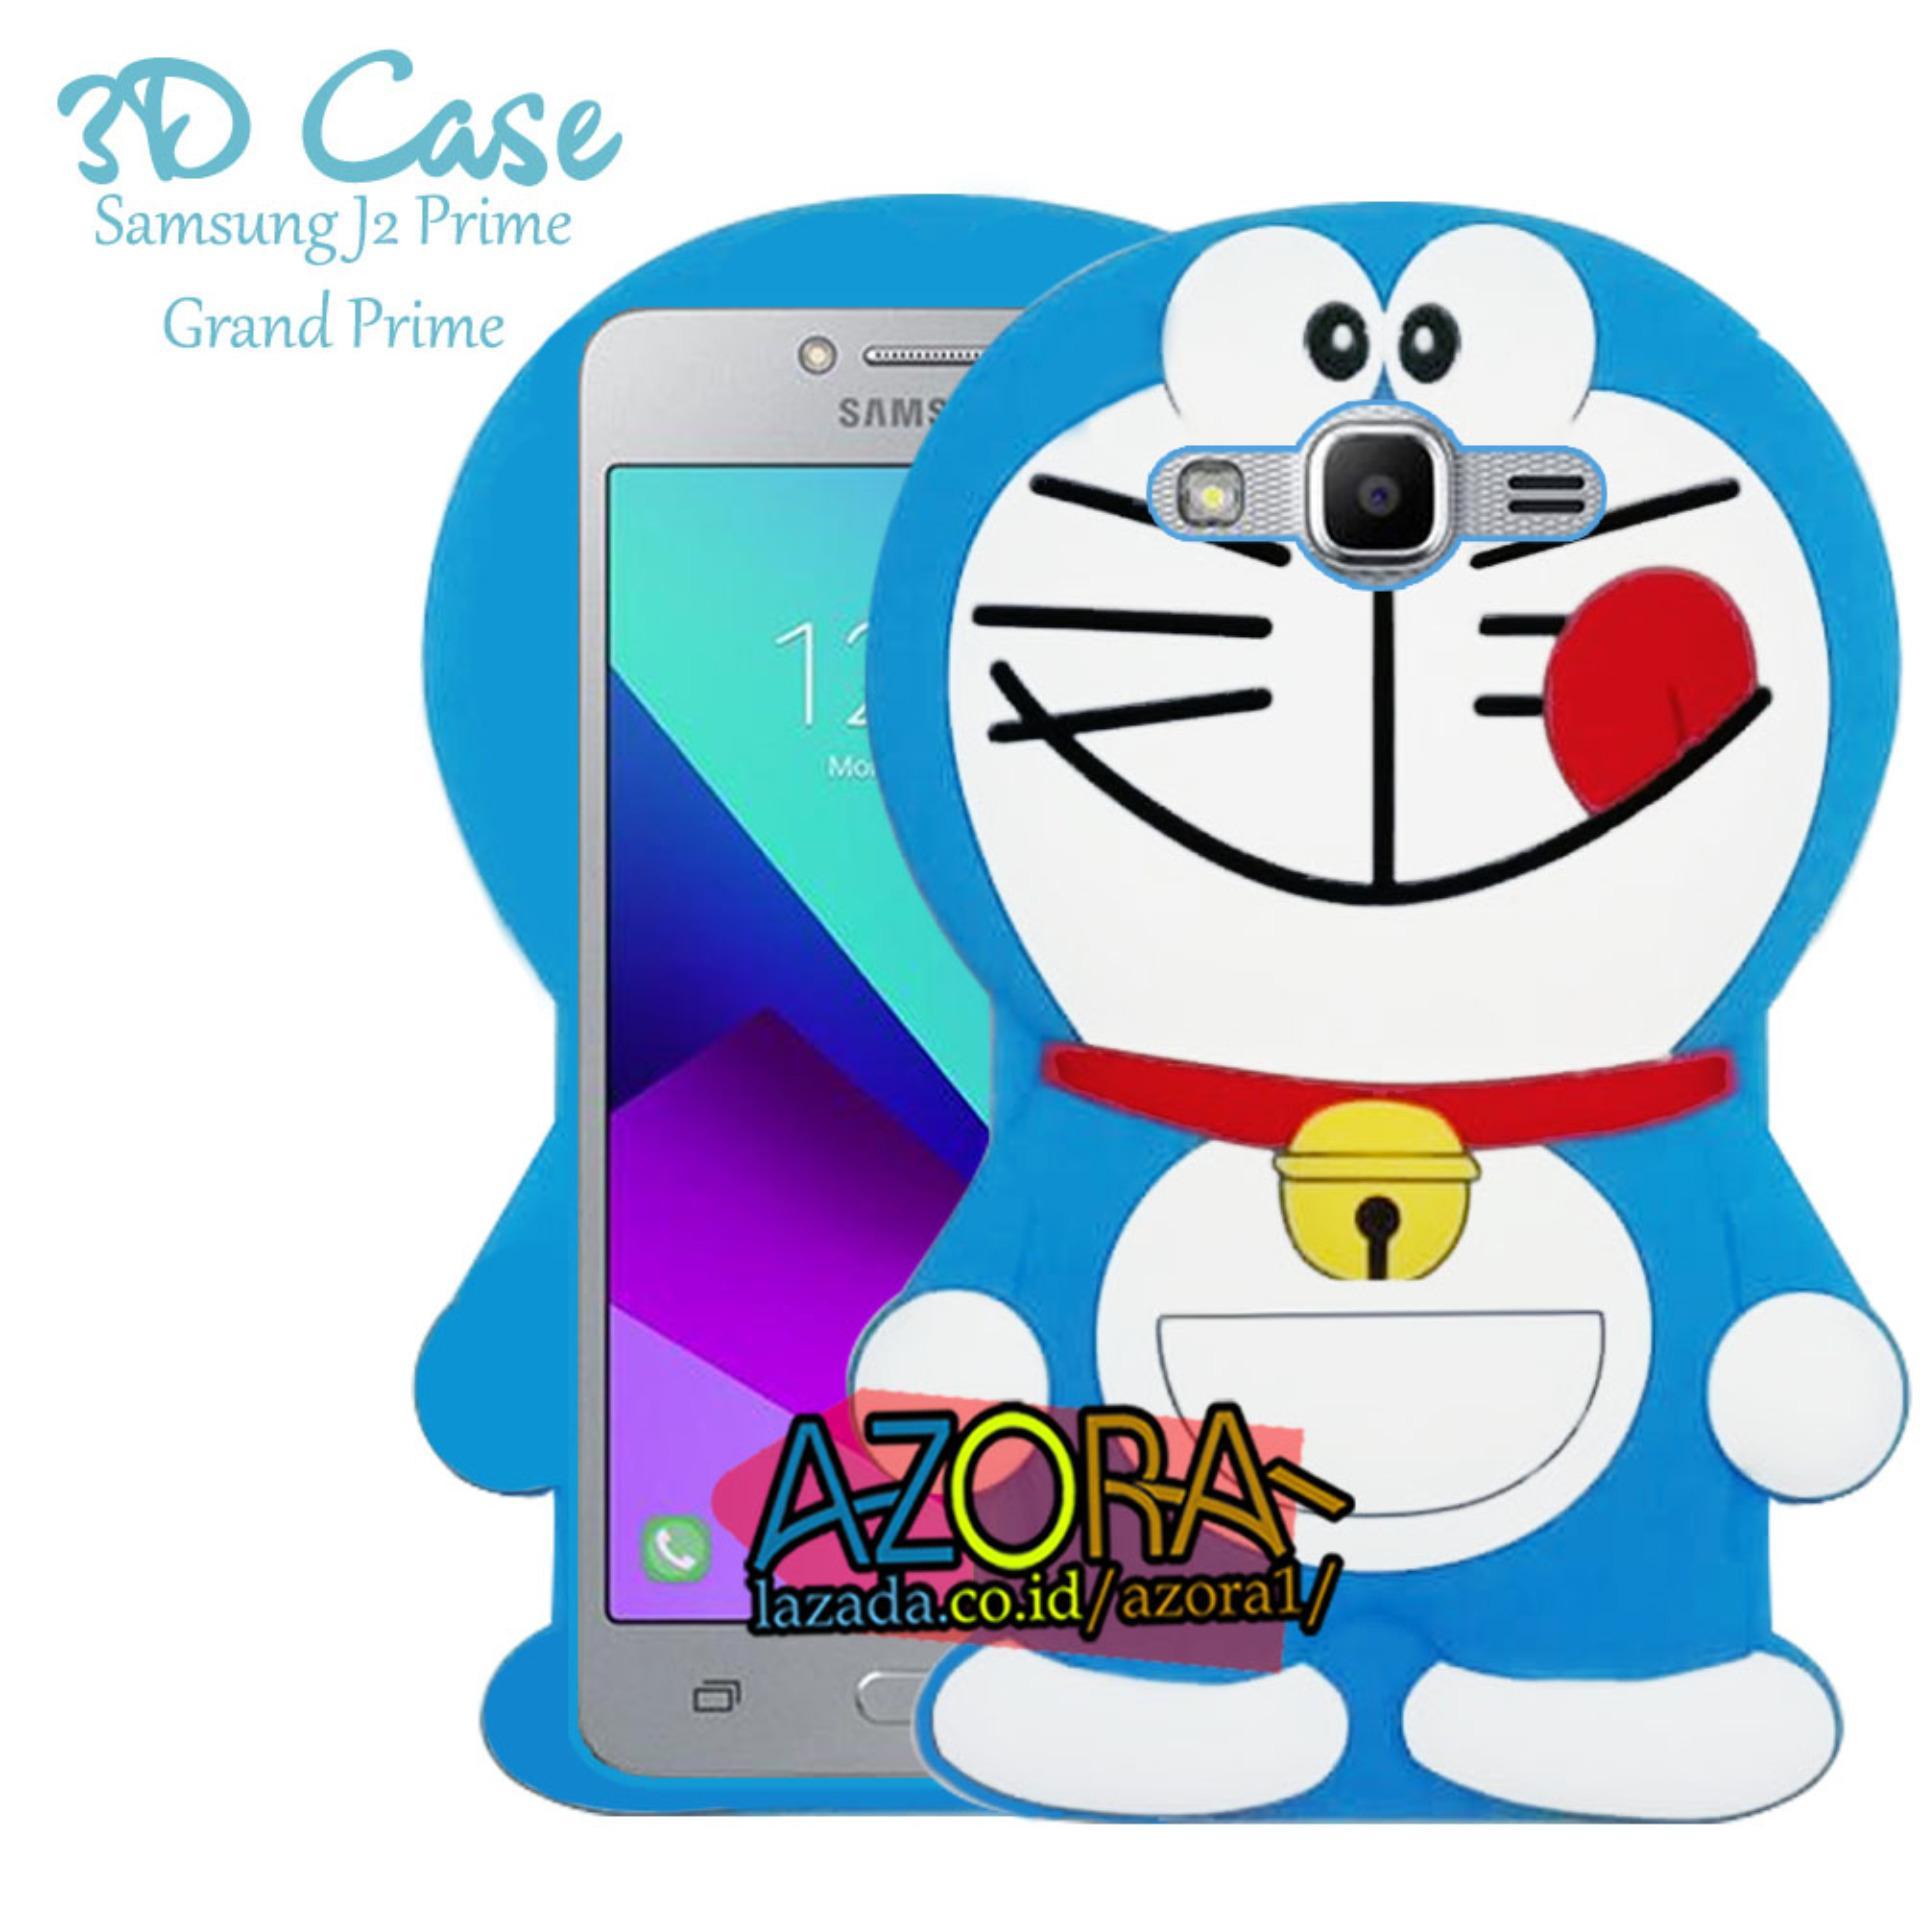 3D Case Samsung Galaxy J2 Prime / Grand Prime Softcase 4D Karakter Boneka Hello Kitty Doraemon